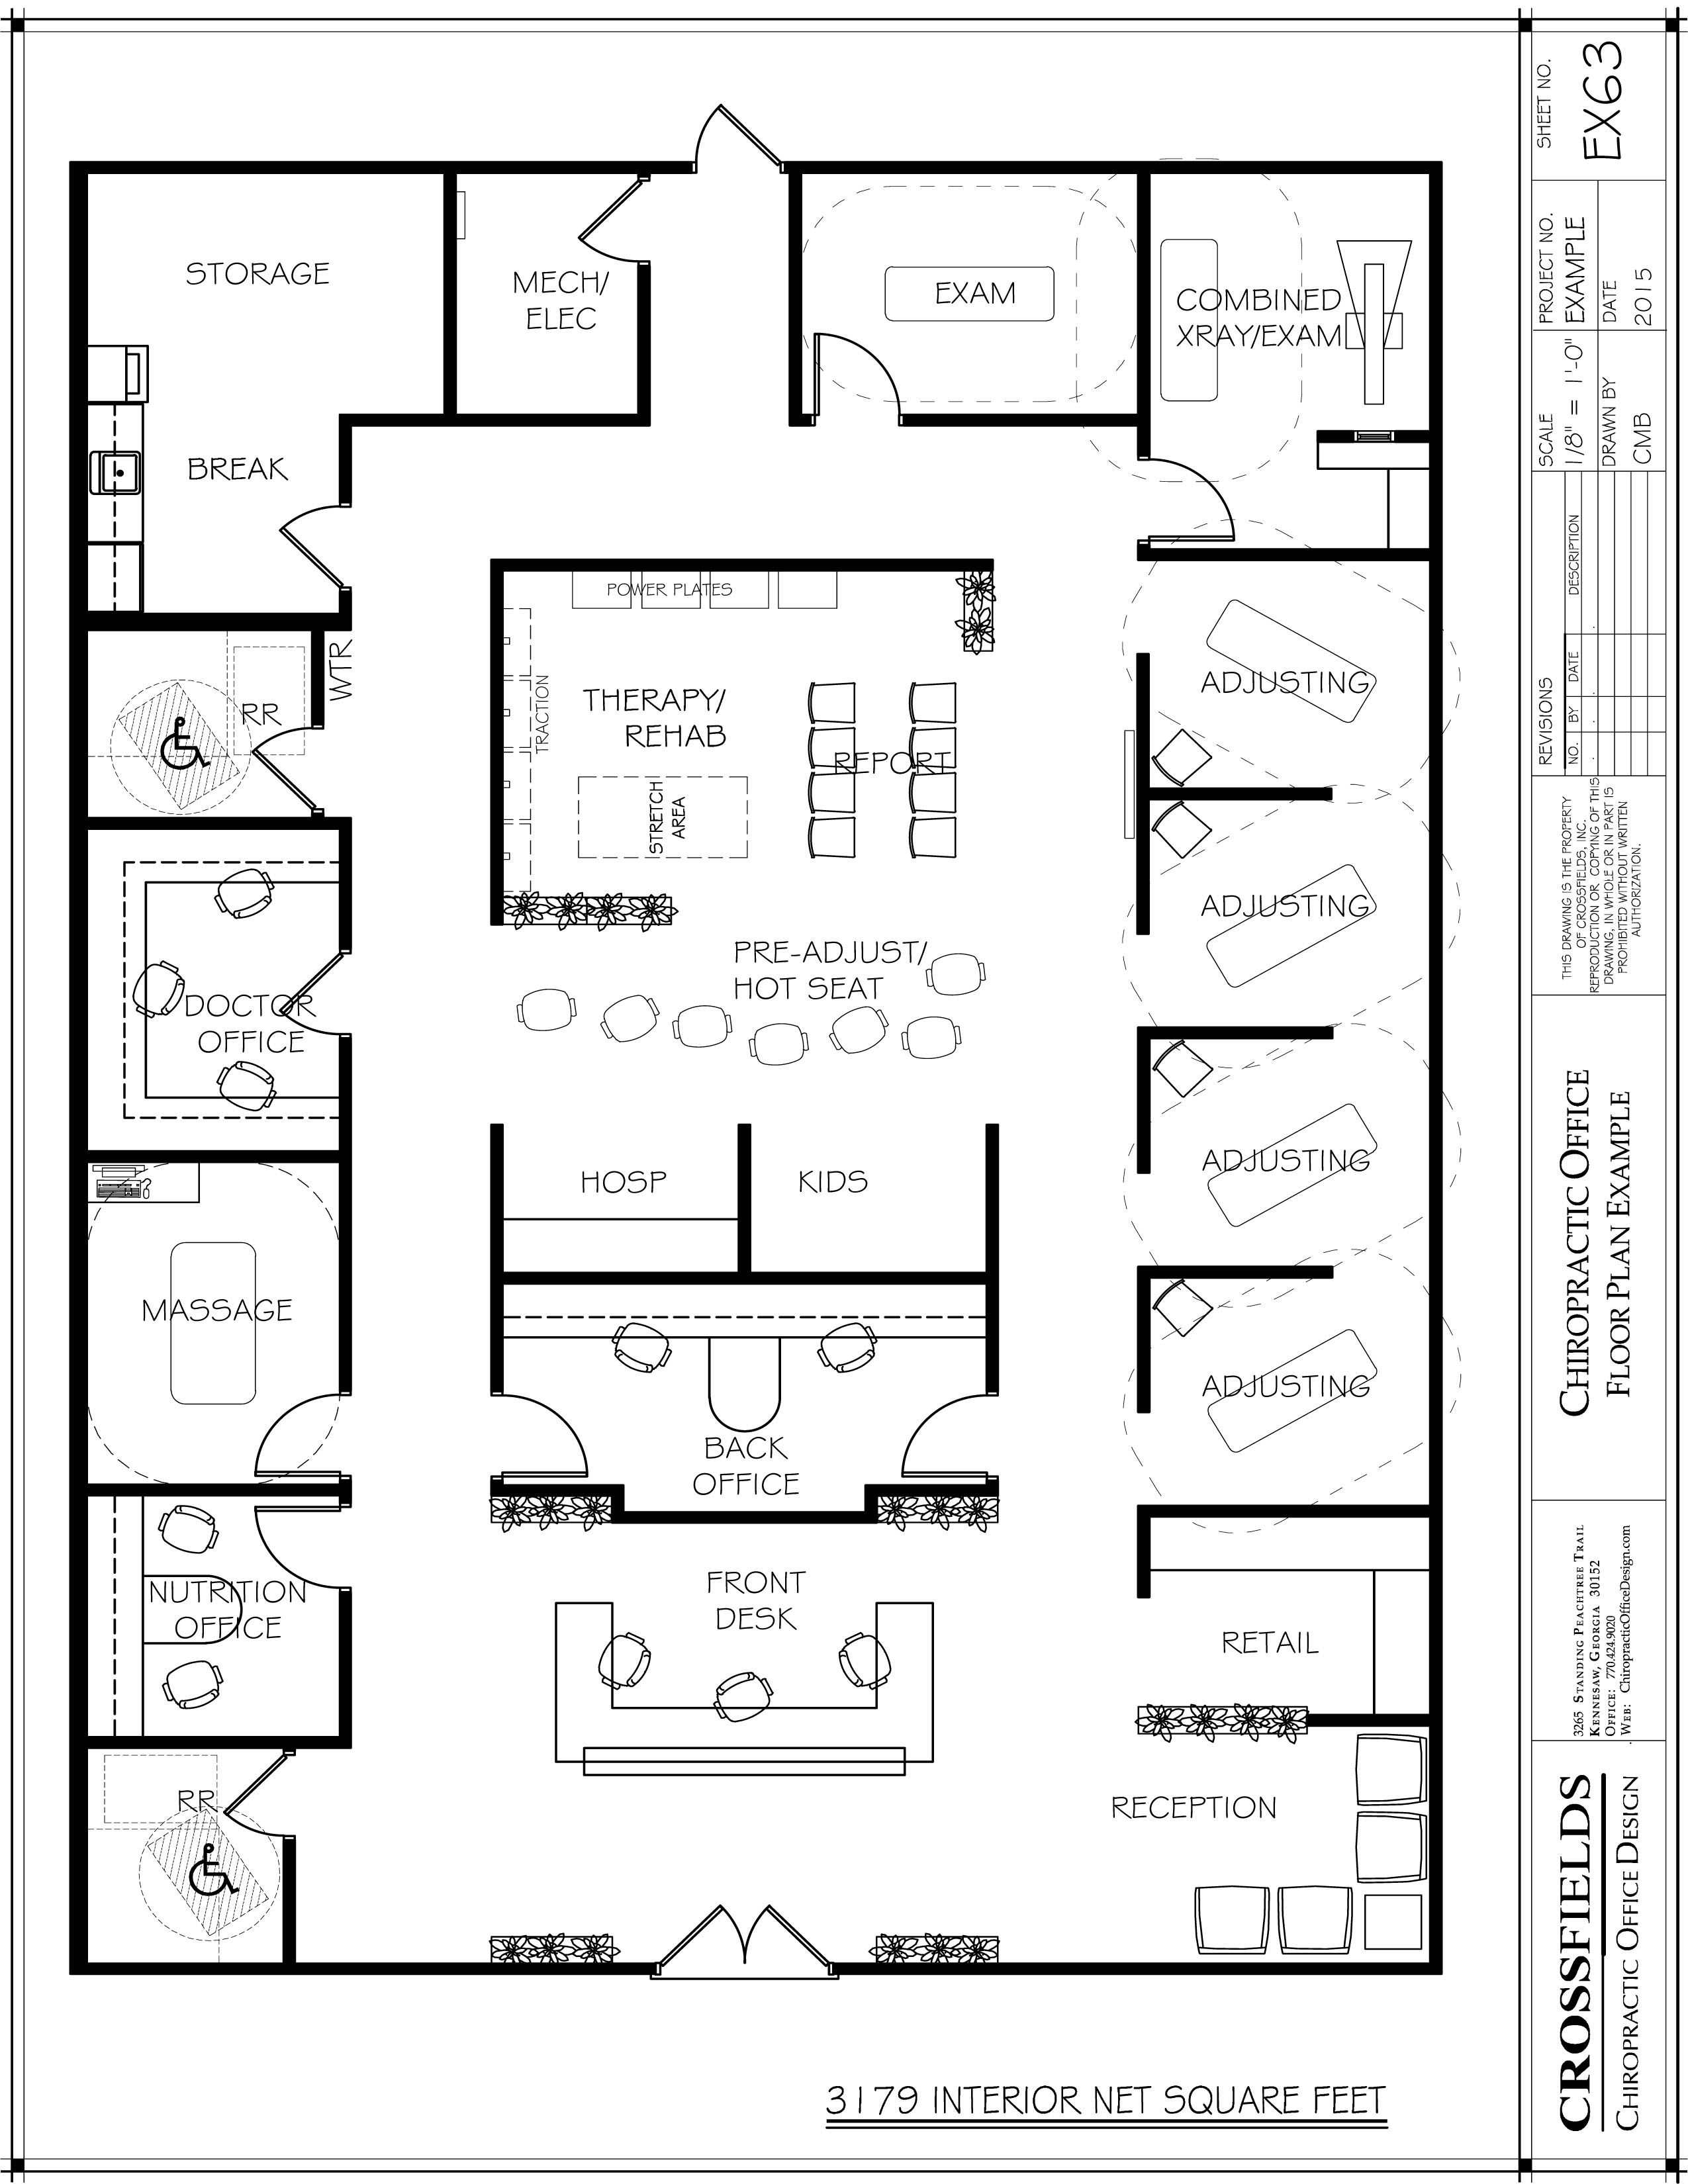 clinic layout diagrams wiring diagram blogclinic layout diagrams wiring diagram chiropractic office floor plans versatile medical [ 2550 x 3300 Pixel ]